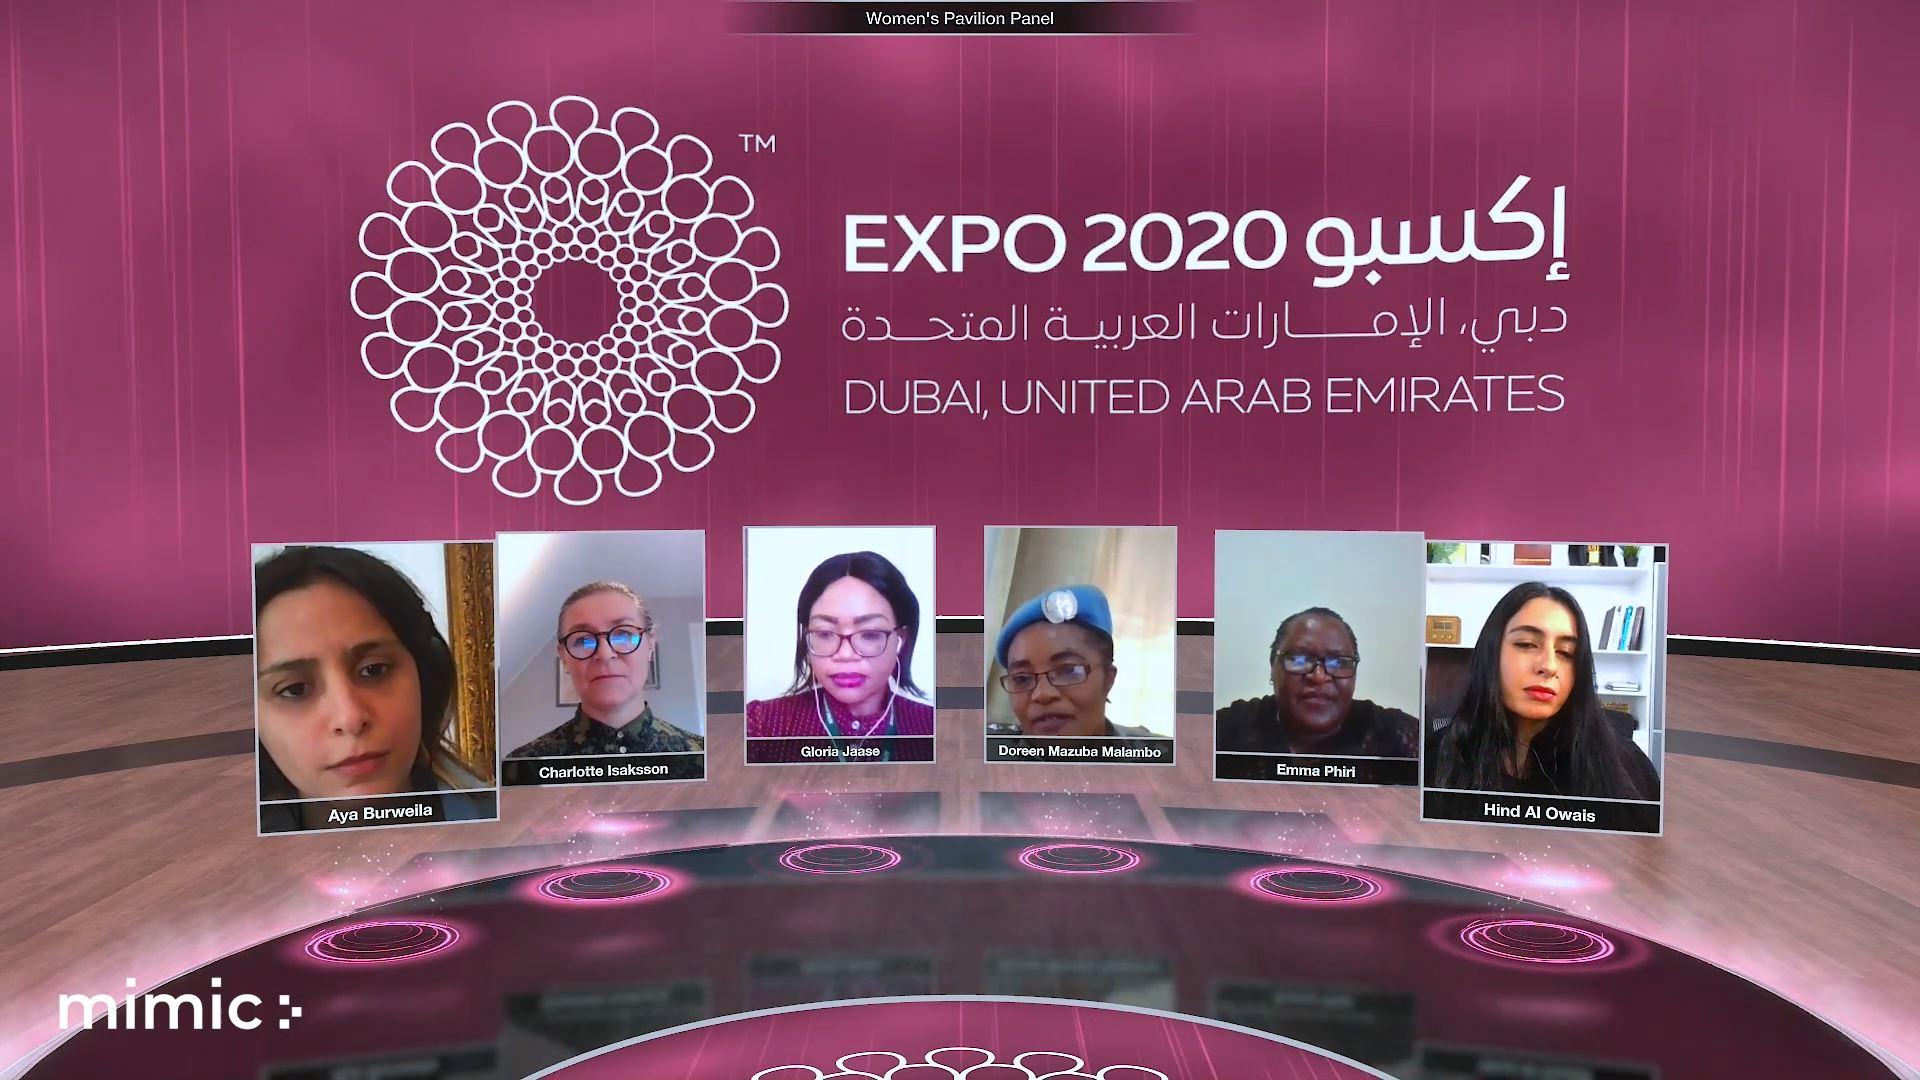 Expo 2020 tolerance and inclusivity Virtual event panel discussion